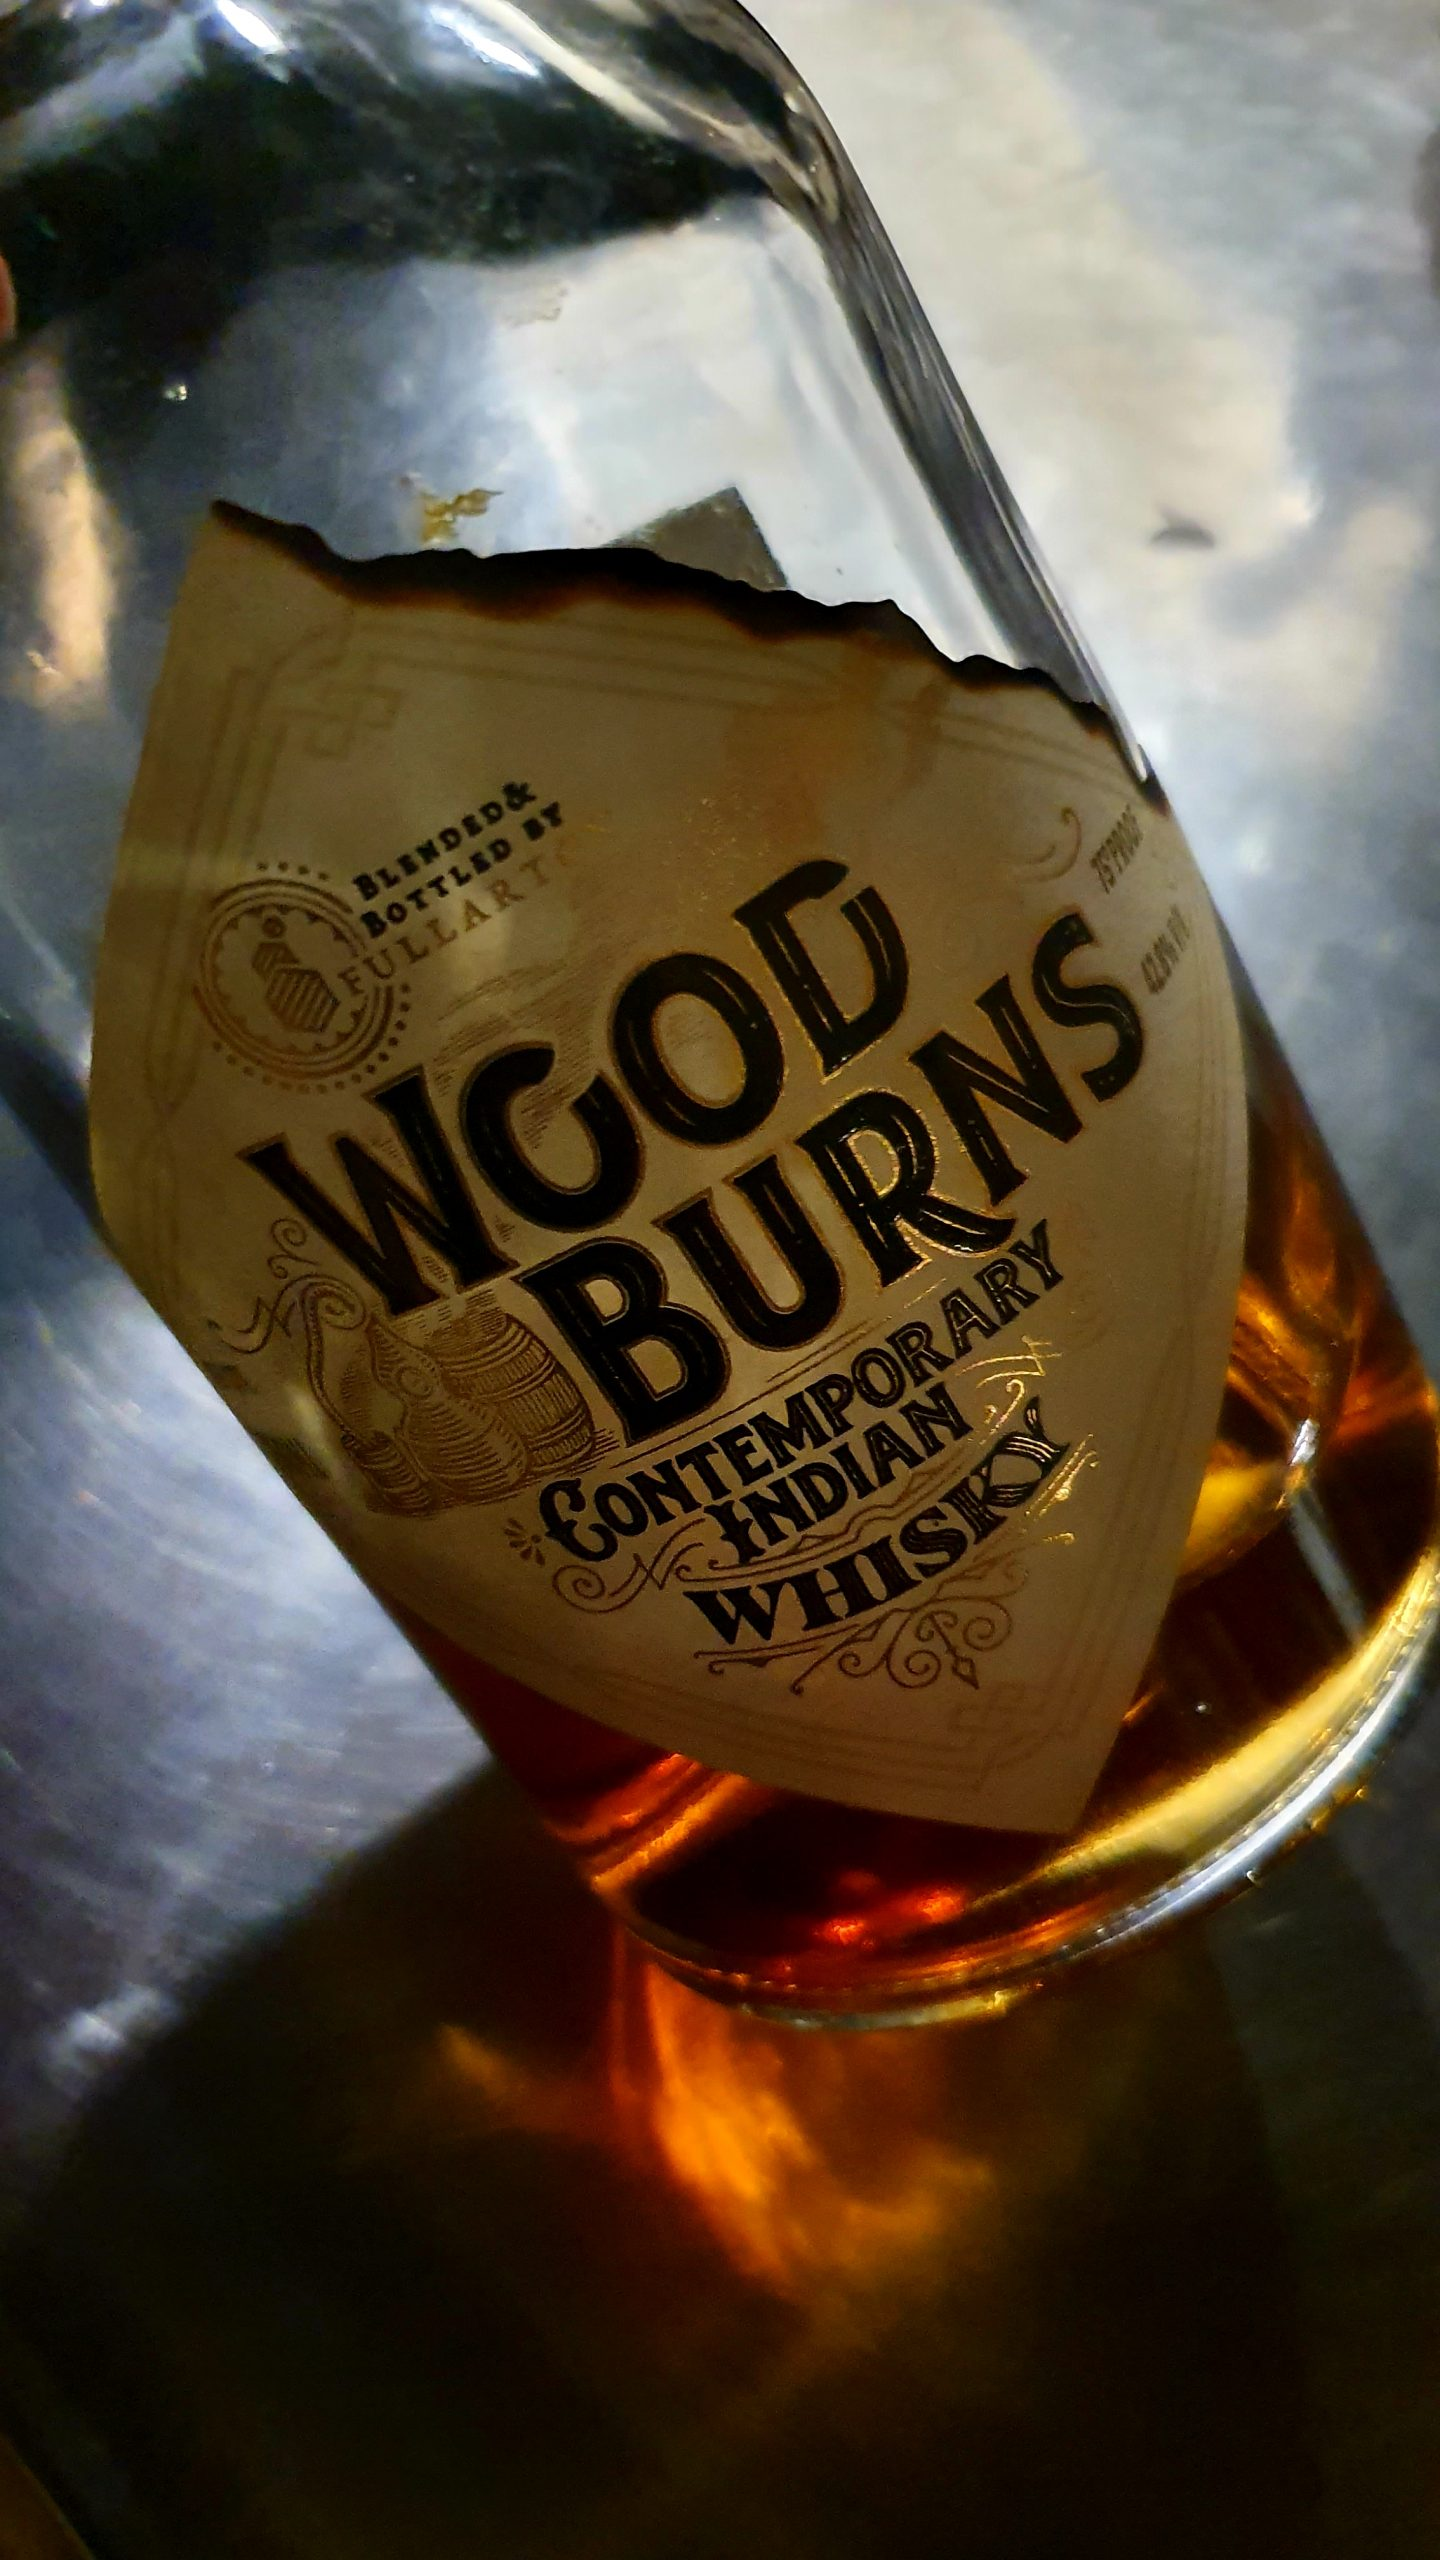 Woodburns Indian whisky